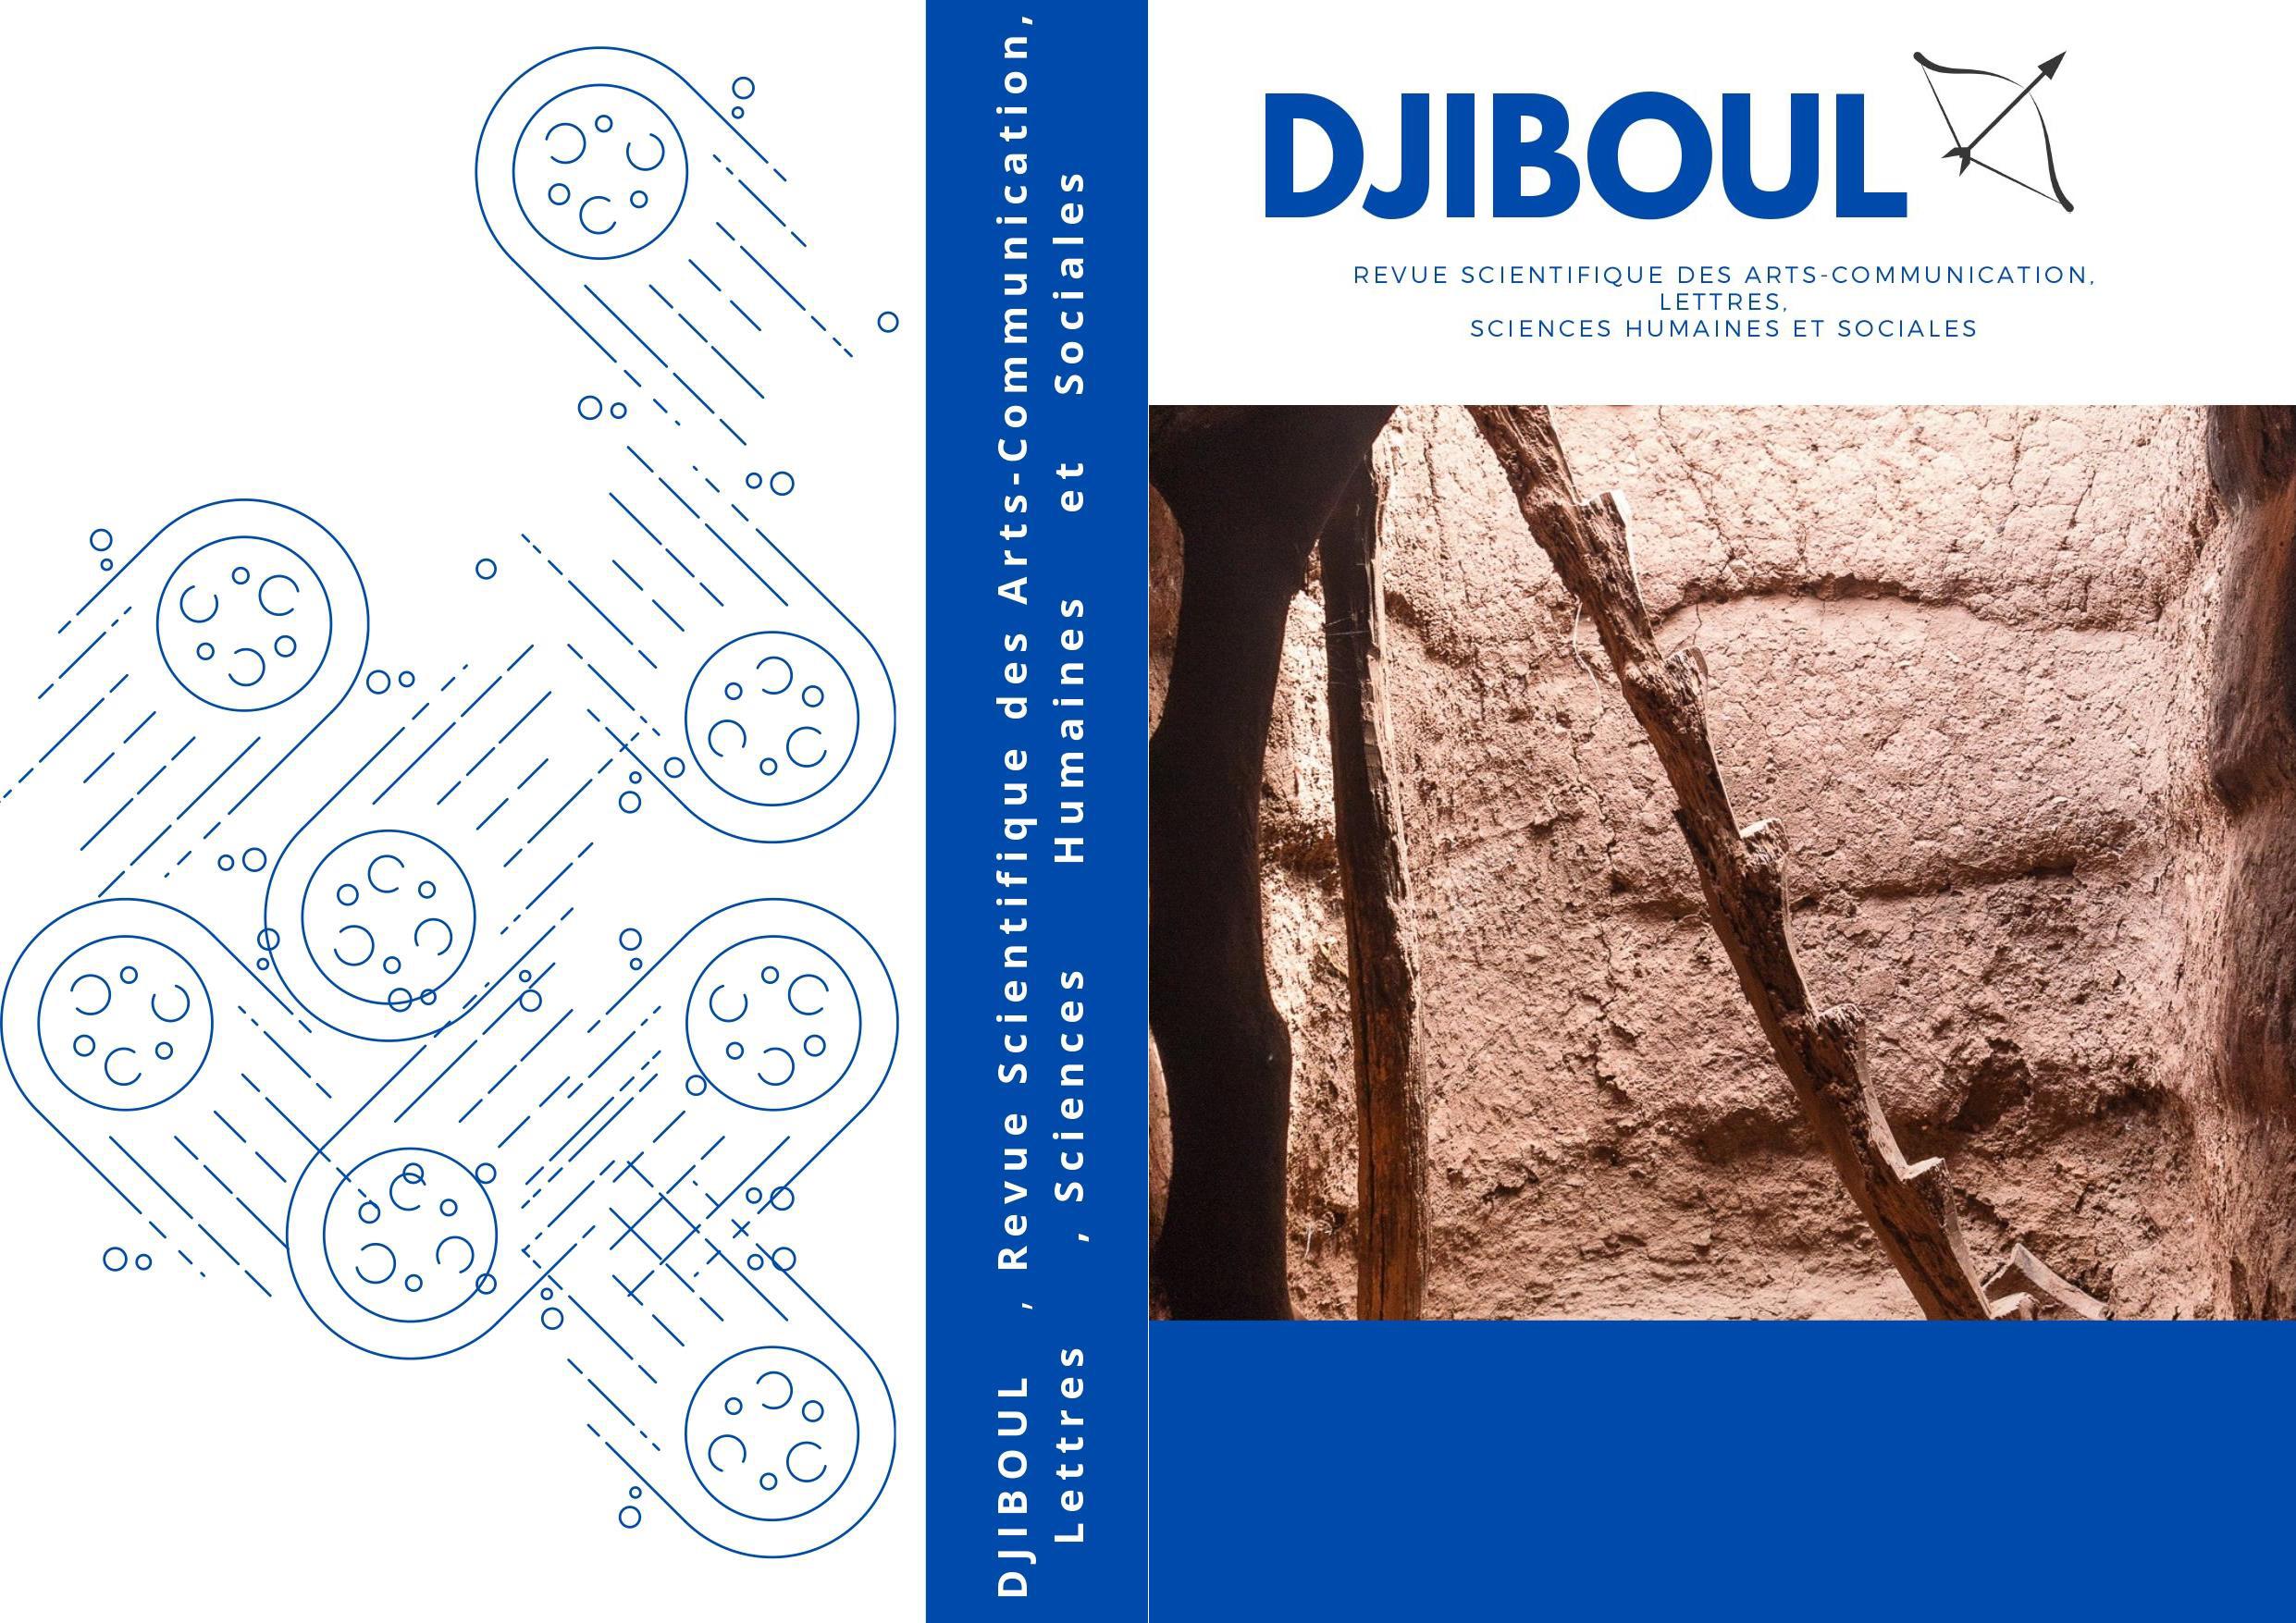 Djiboul